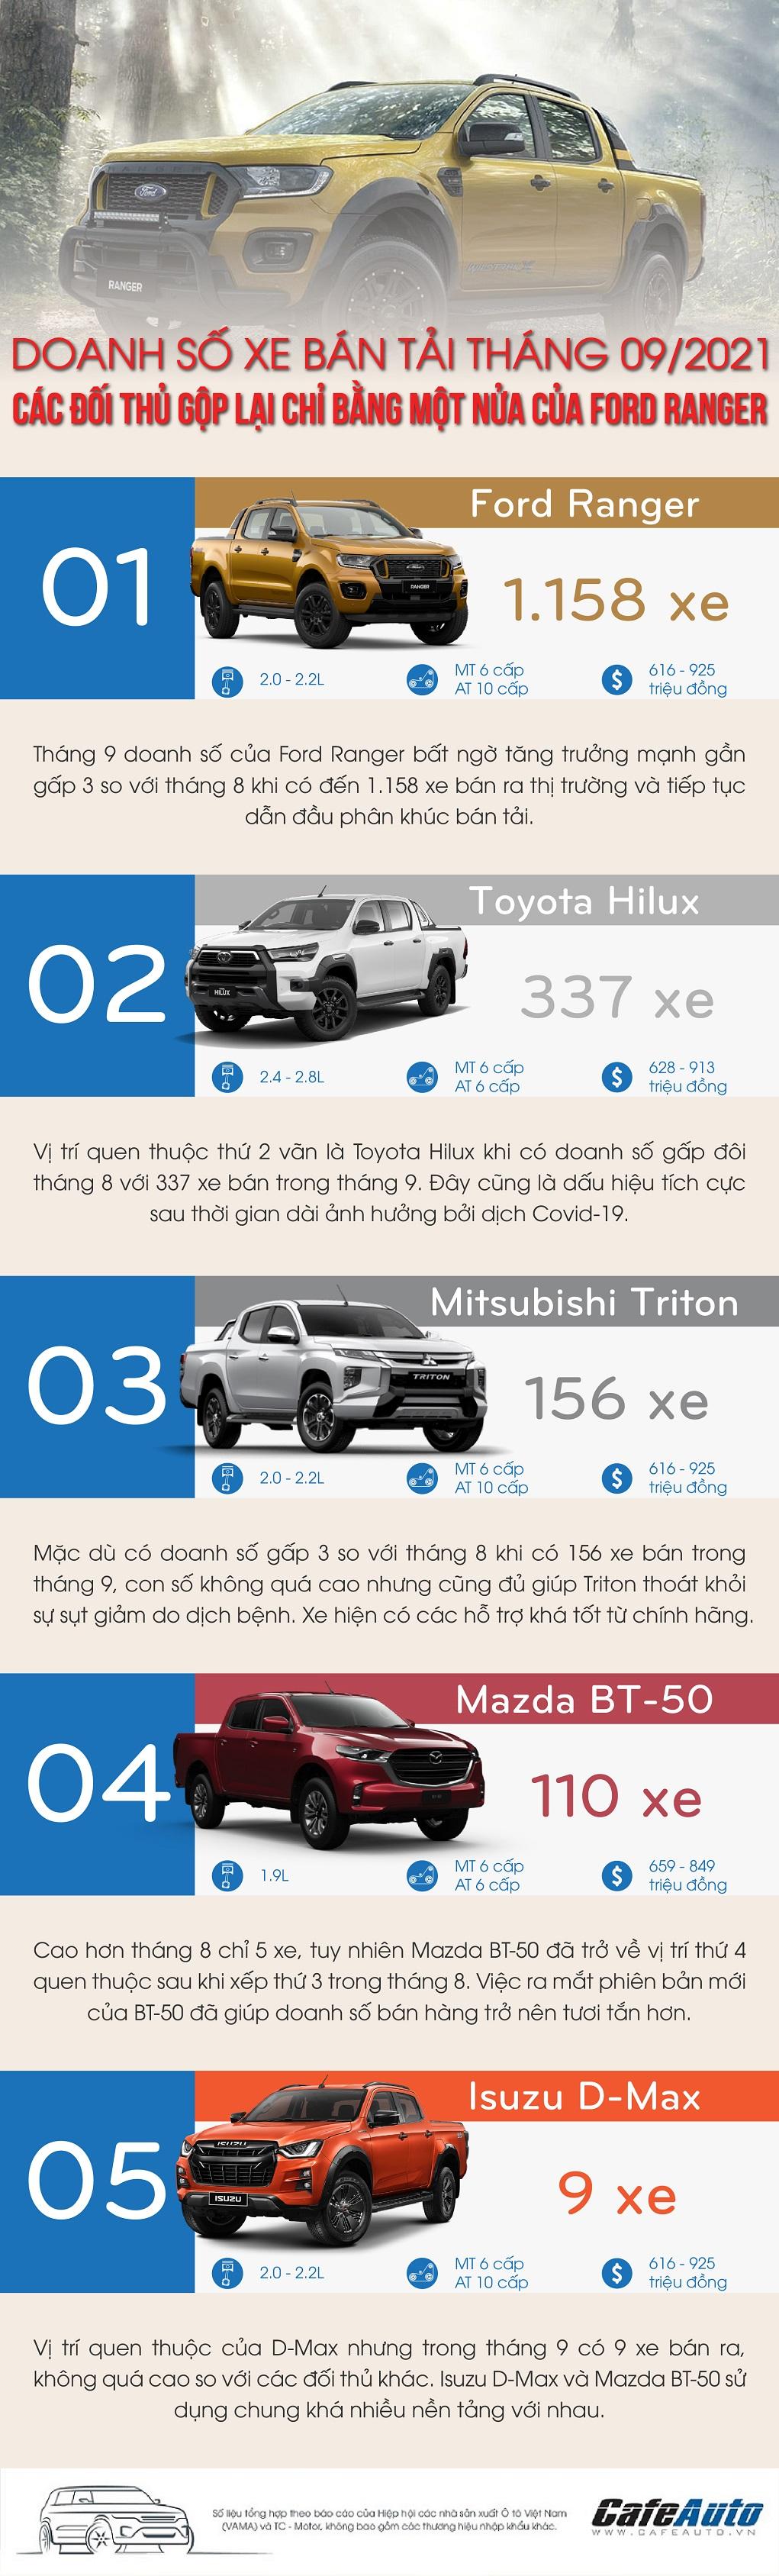 doanh-so-xe-ban-tai-thang-9-2021-ford-ranger-bo-xa-cac-doi-thu